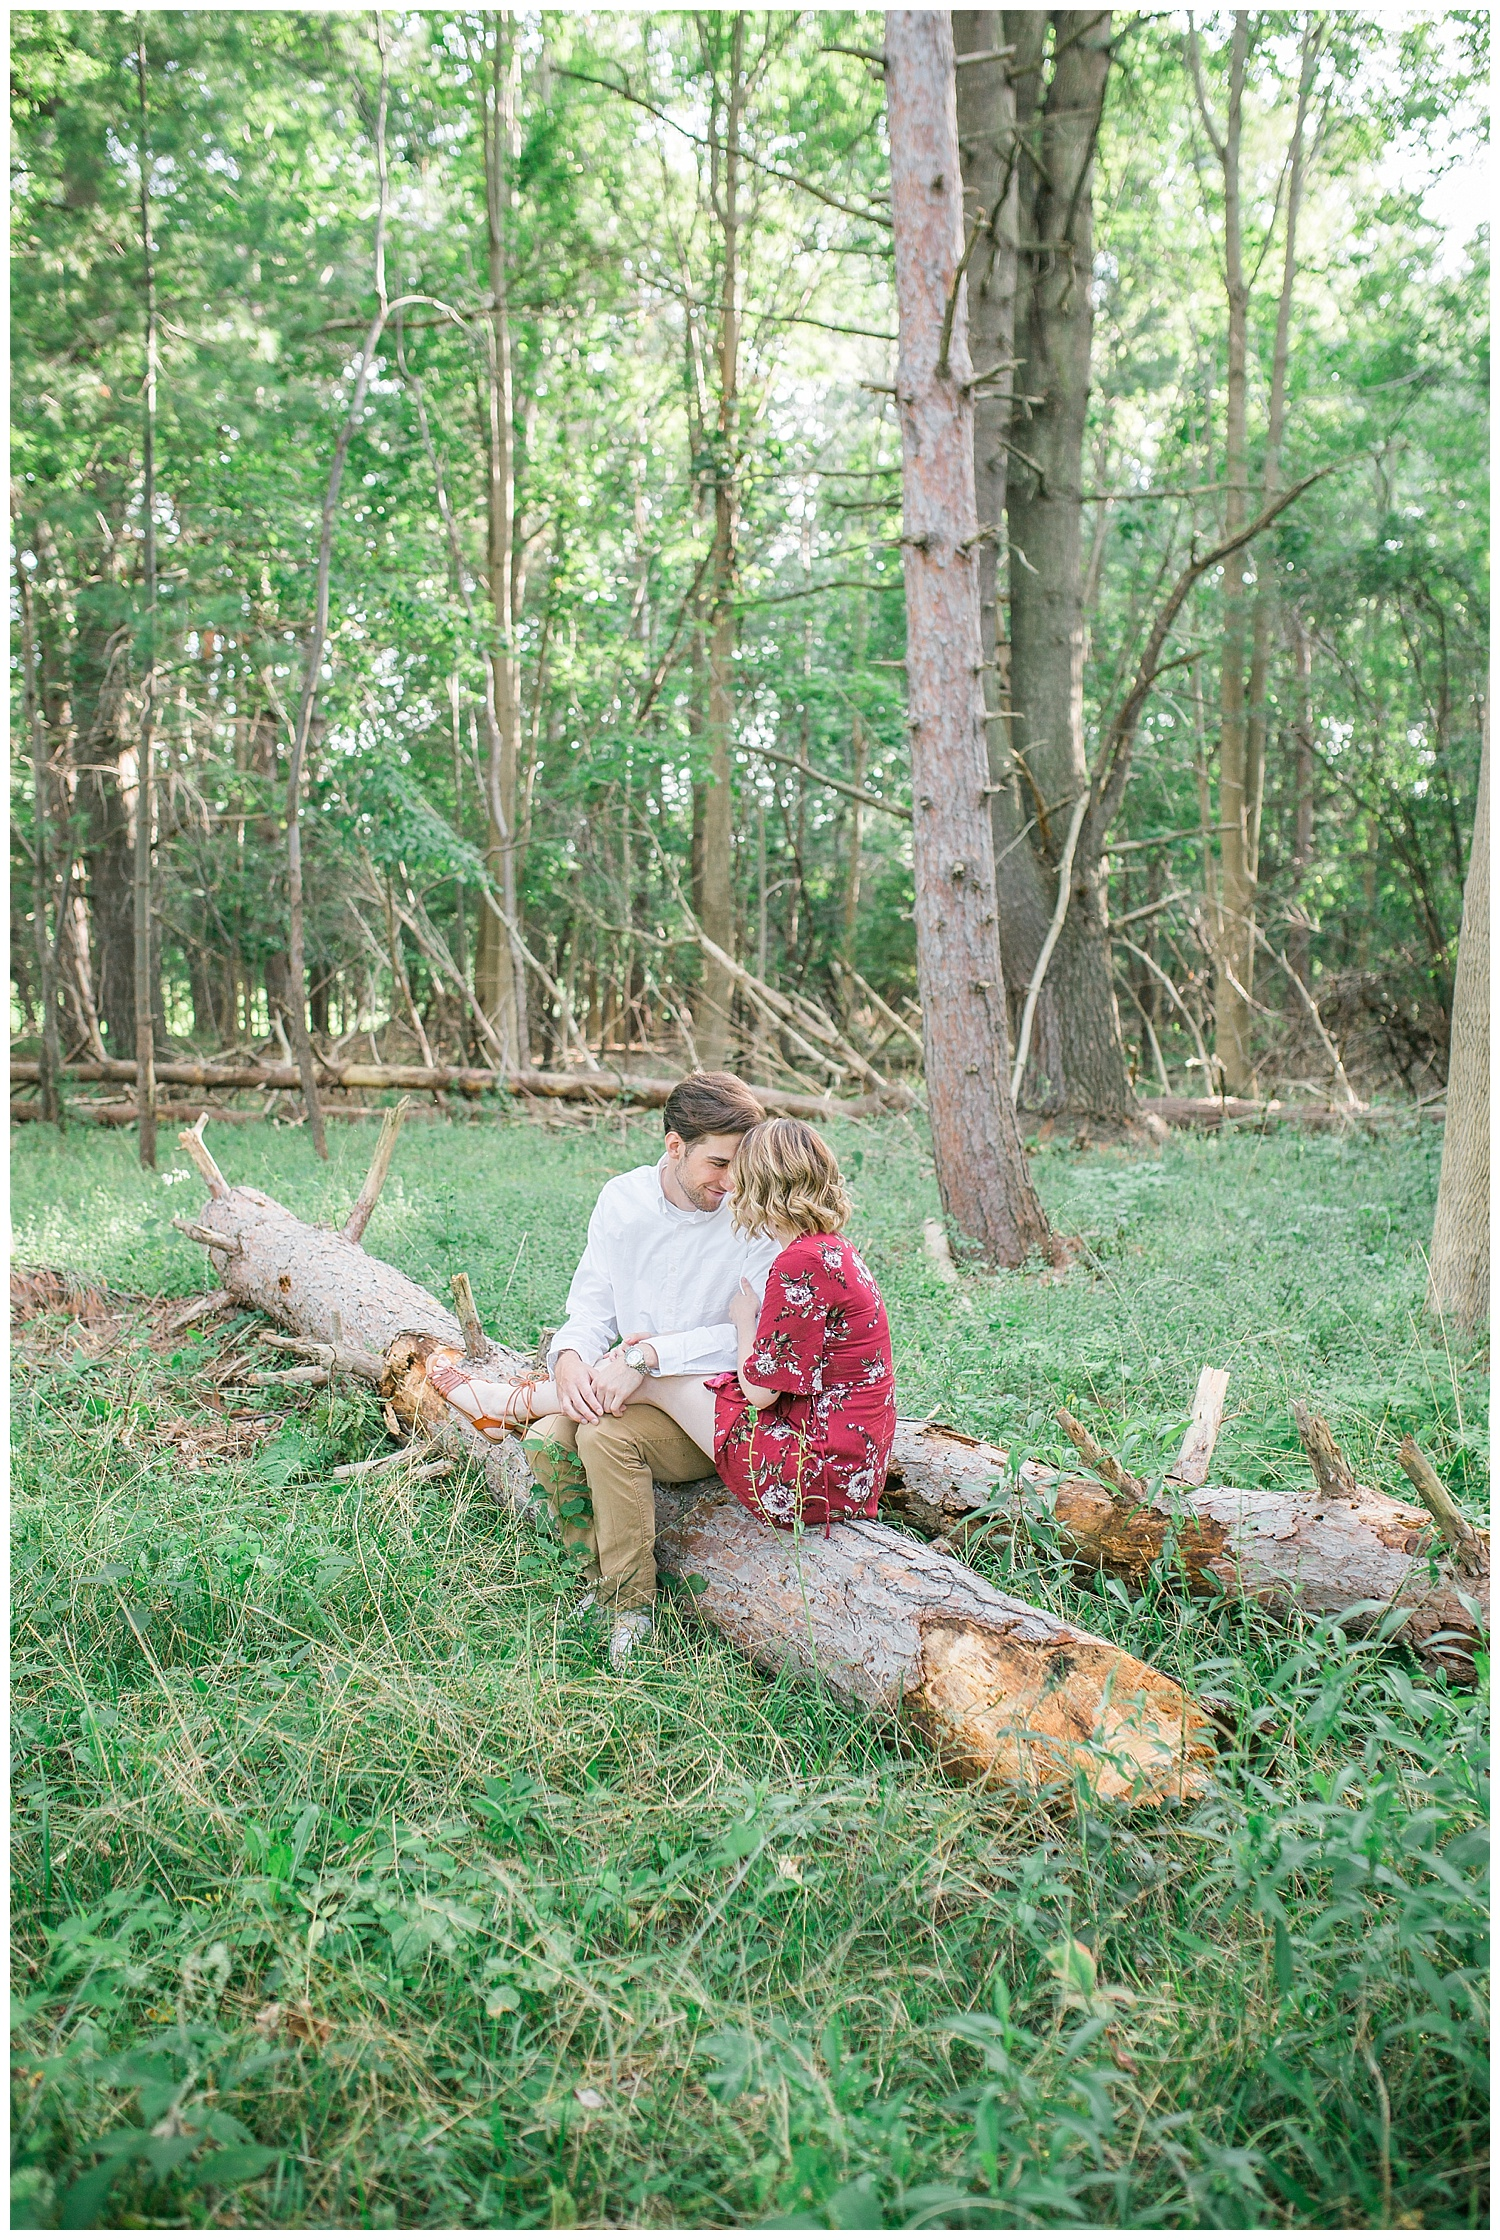 Tanya and Ryan - Sweetheart session - Lass & Beau - Geneseo NY-40_Buffalo wedding photography.jpg